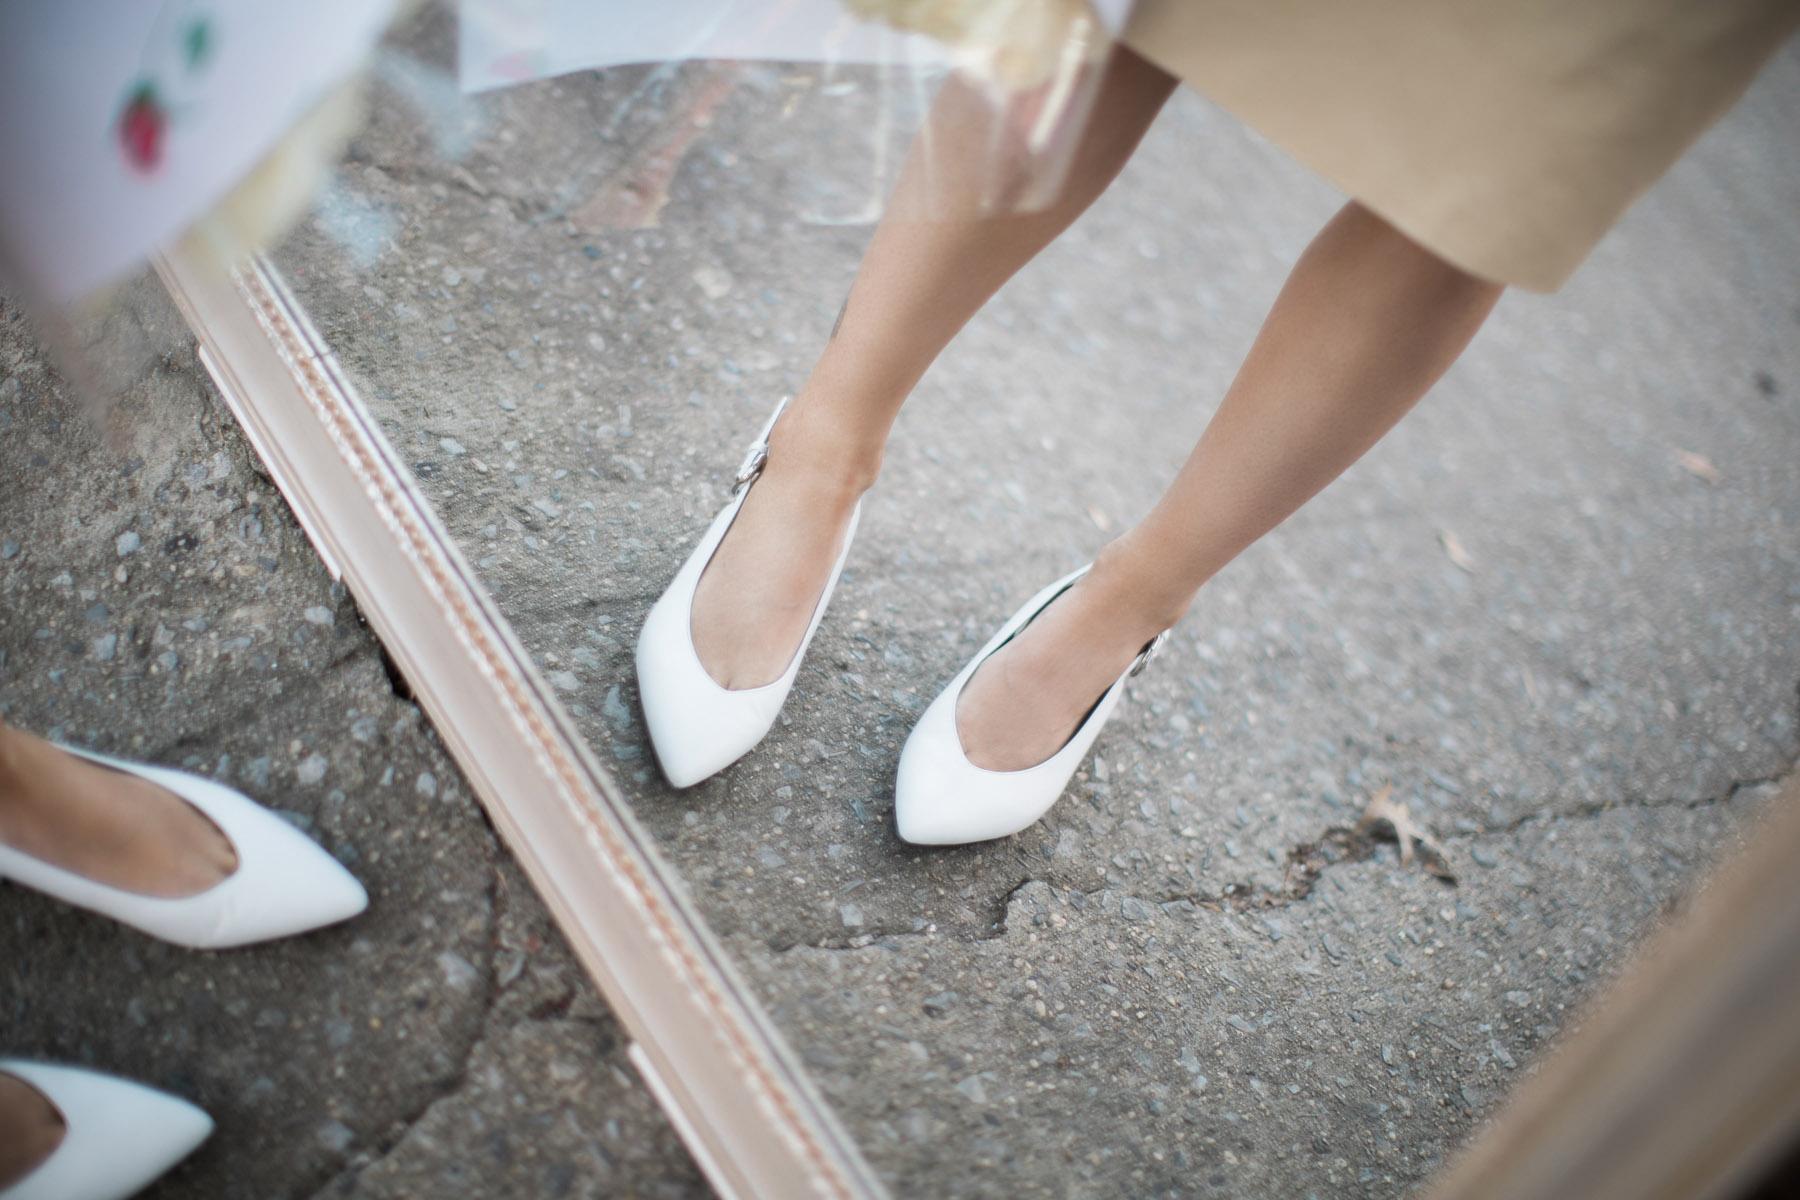 What to wear to a job interview - Marc Fisher LTD Fancya Pointy Toe Block Heel // NotJessFashion.com